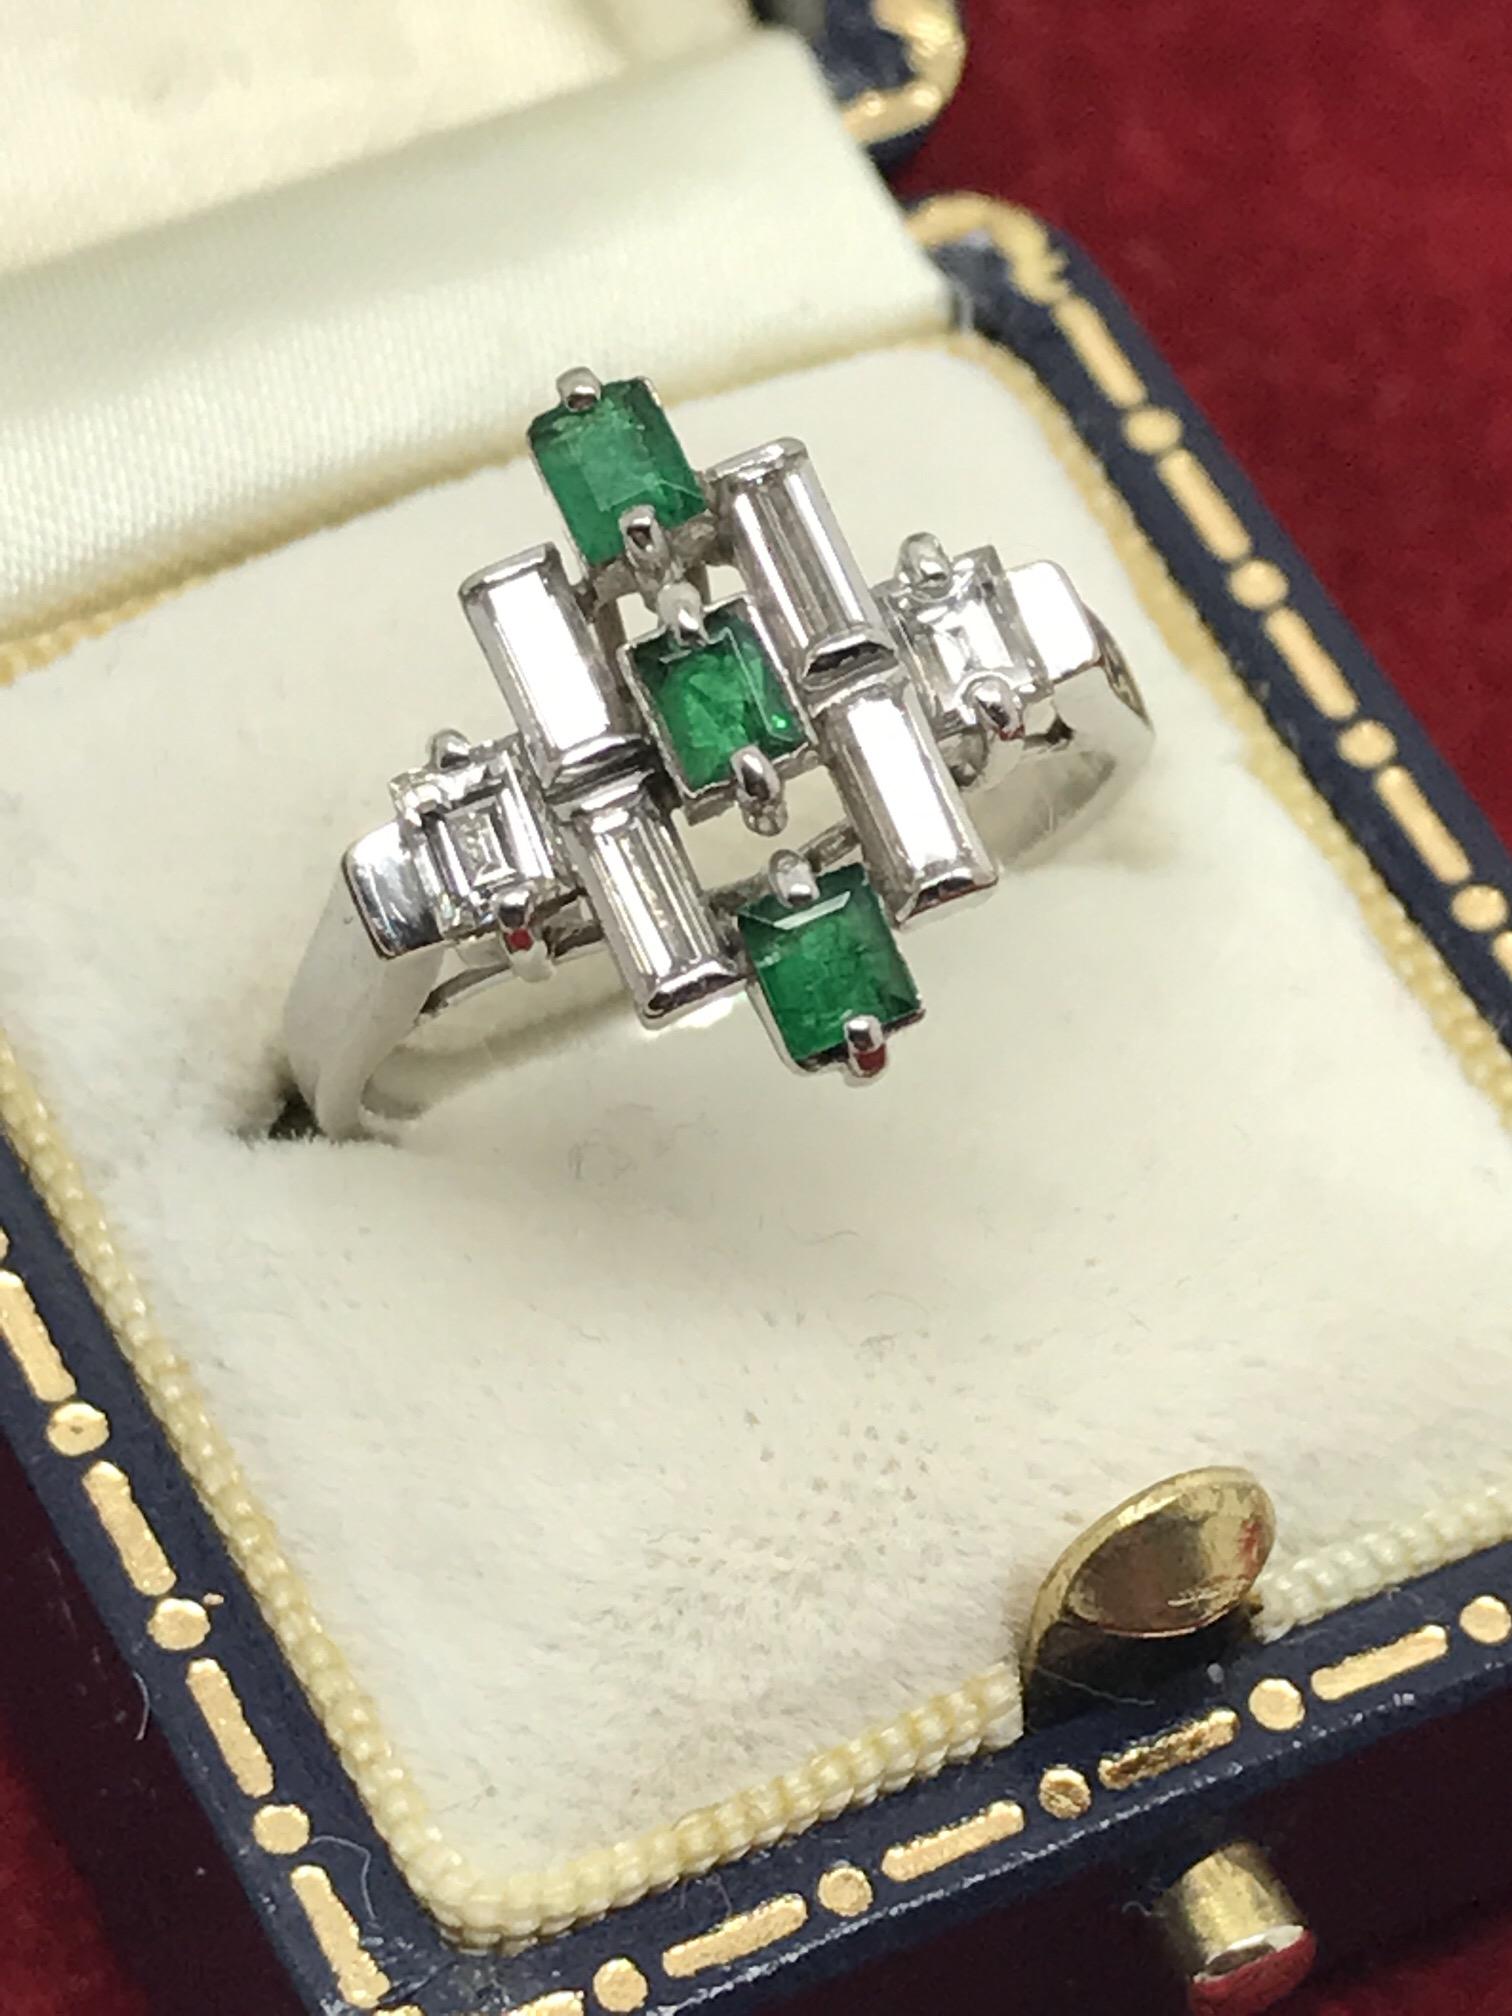 Lot 36 - LOVELY VINTAGE EMERALD & DIAMOND RING SET IN WHITE GOLD